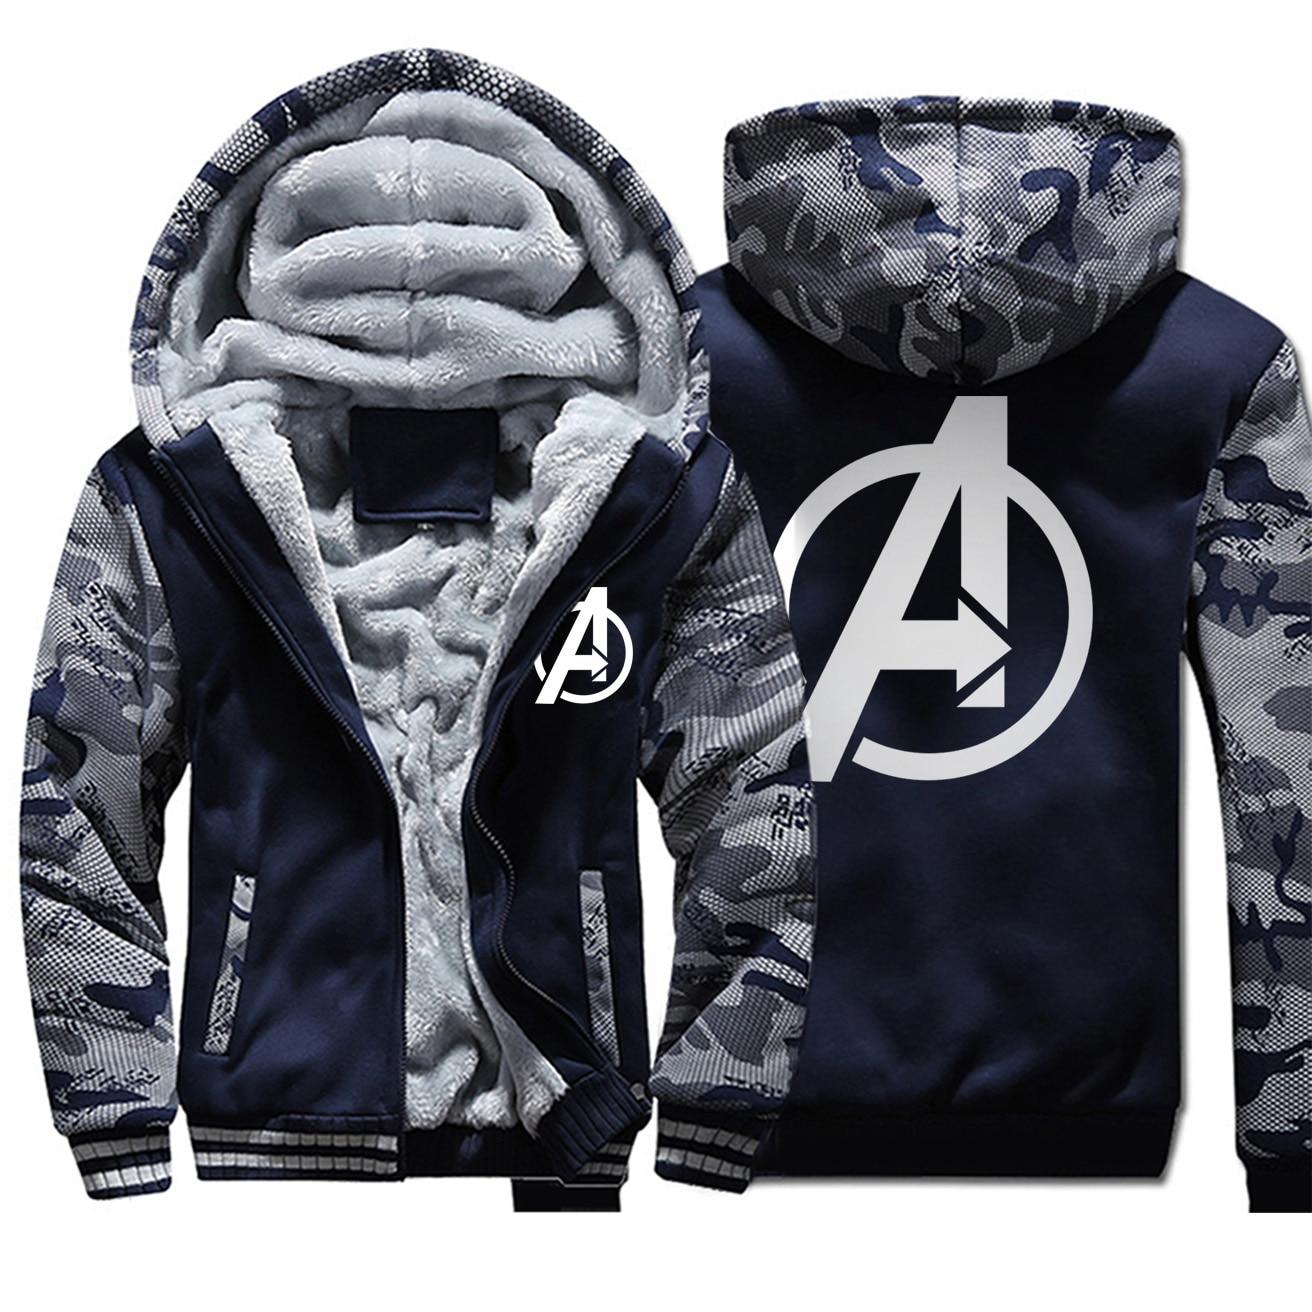 The Avengers Mens Hoodies Coats 2020 Man Brand Fleece Warm Thick Jackets Male Hip Hop Cool Fashion Loose Sportswear Hooded Coats